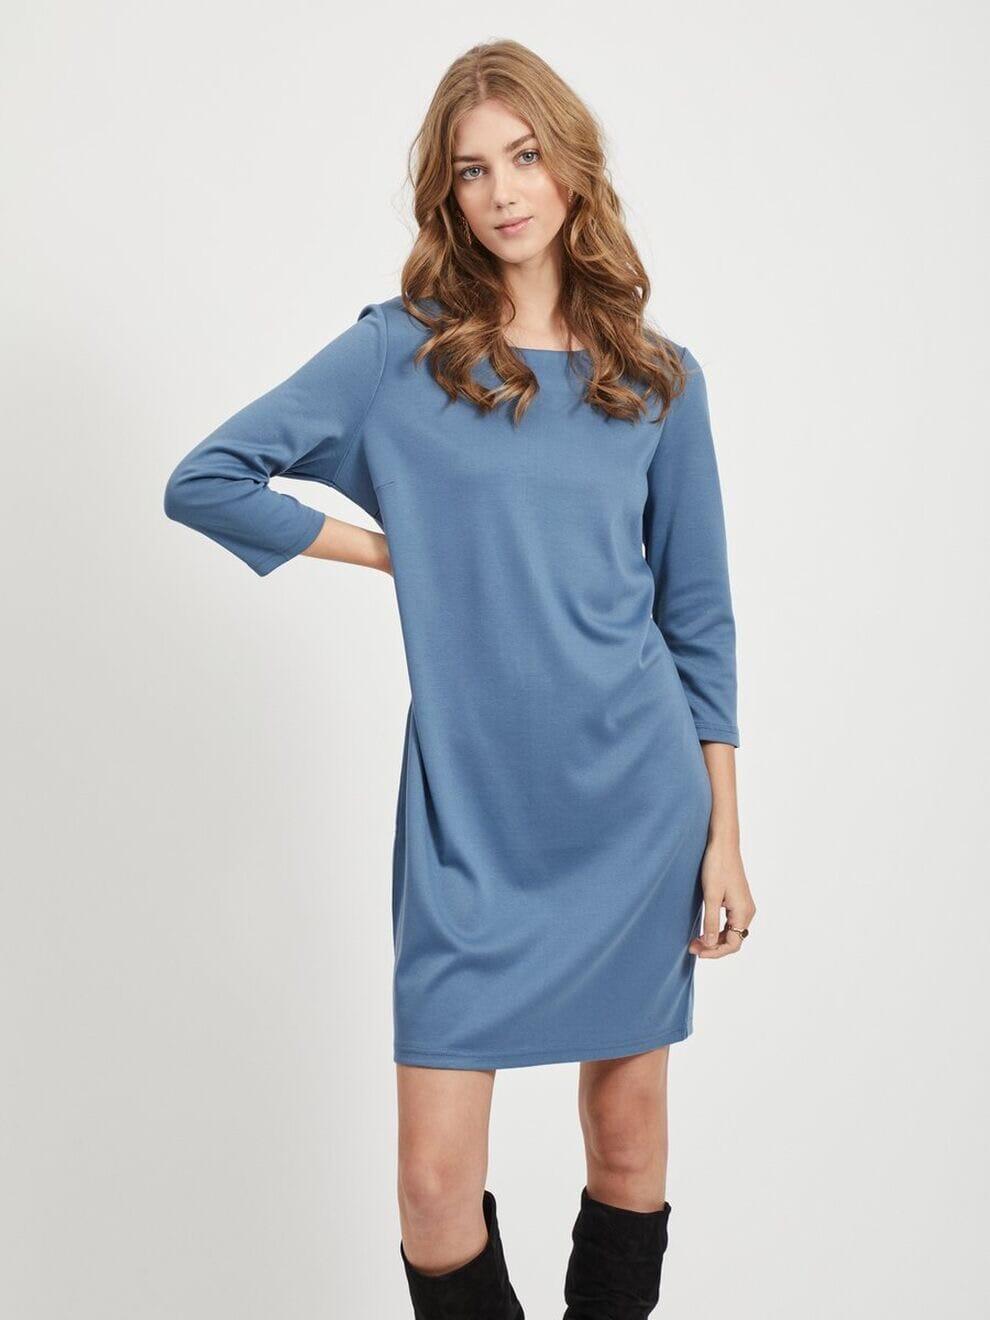 Vitinny kjole China Blue Studio Mote